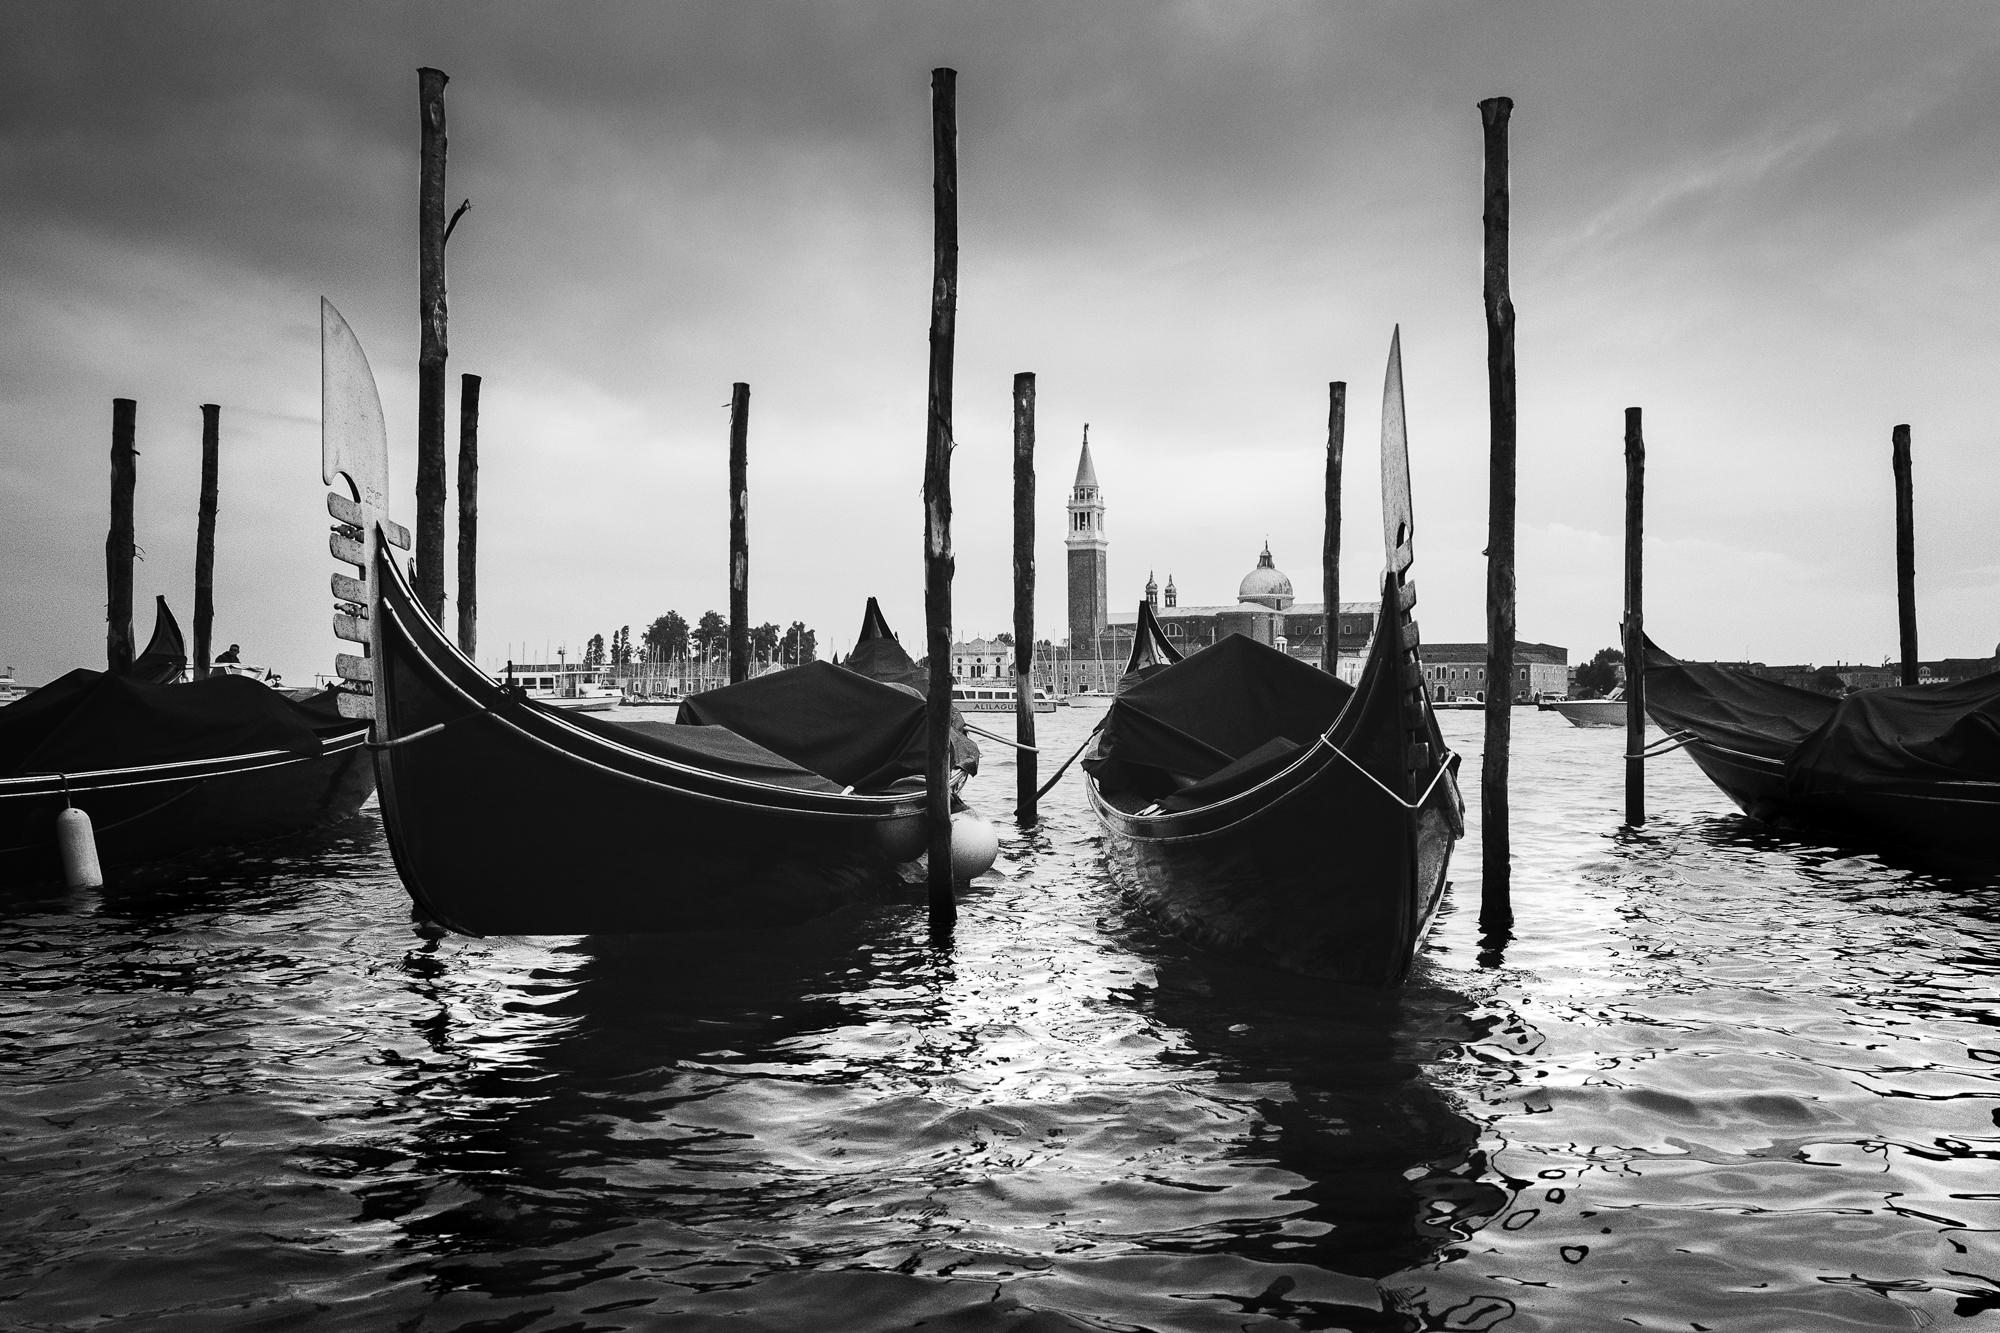 A photo of Gondolas in Venice on the San Marco Basin taken by Trevor Sherwin